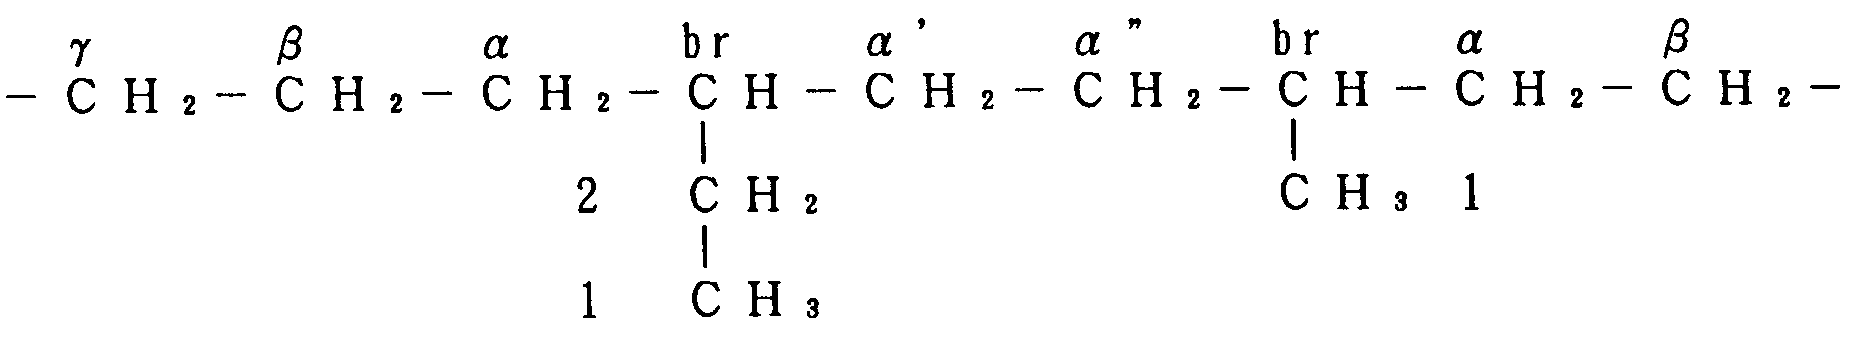 decane cracked into octane and ethene equation grapher